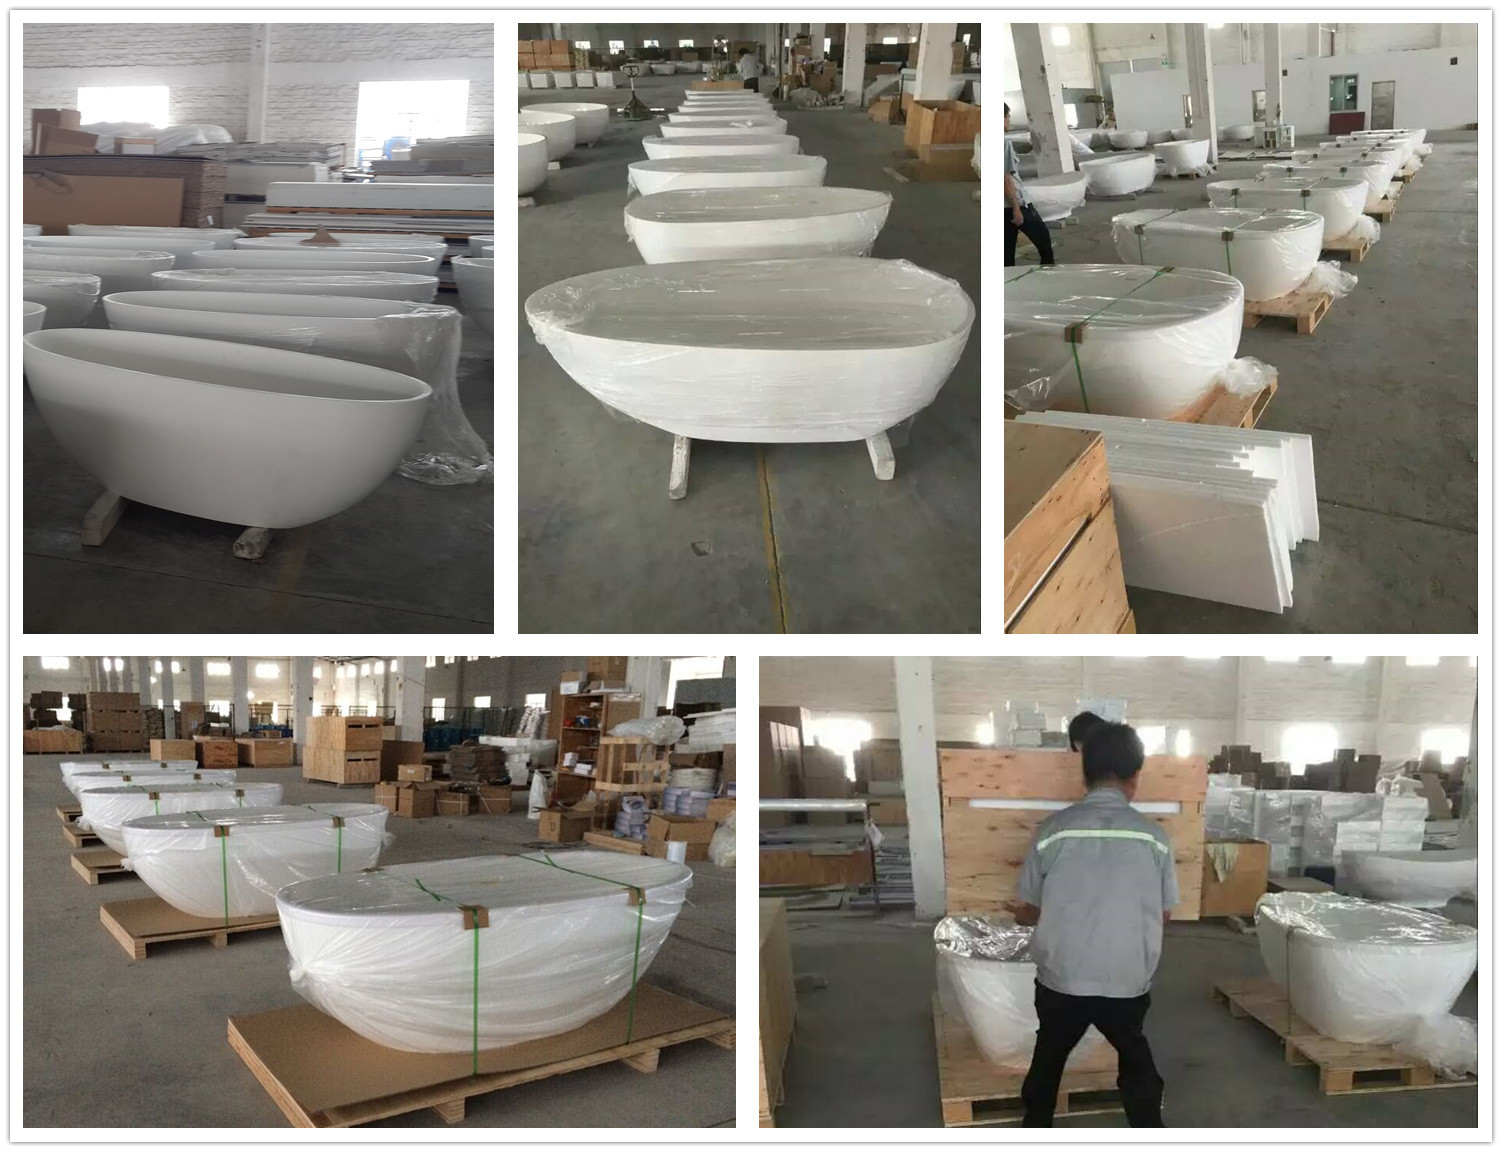 Bellissimo-Professional Oval Shaped Freestanding Floor Mounted Wash Basin-6